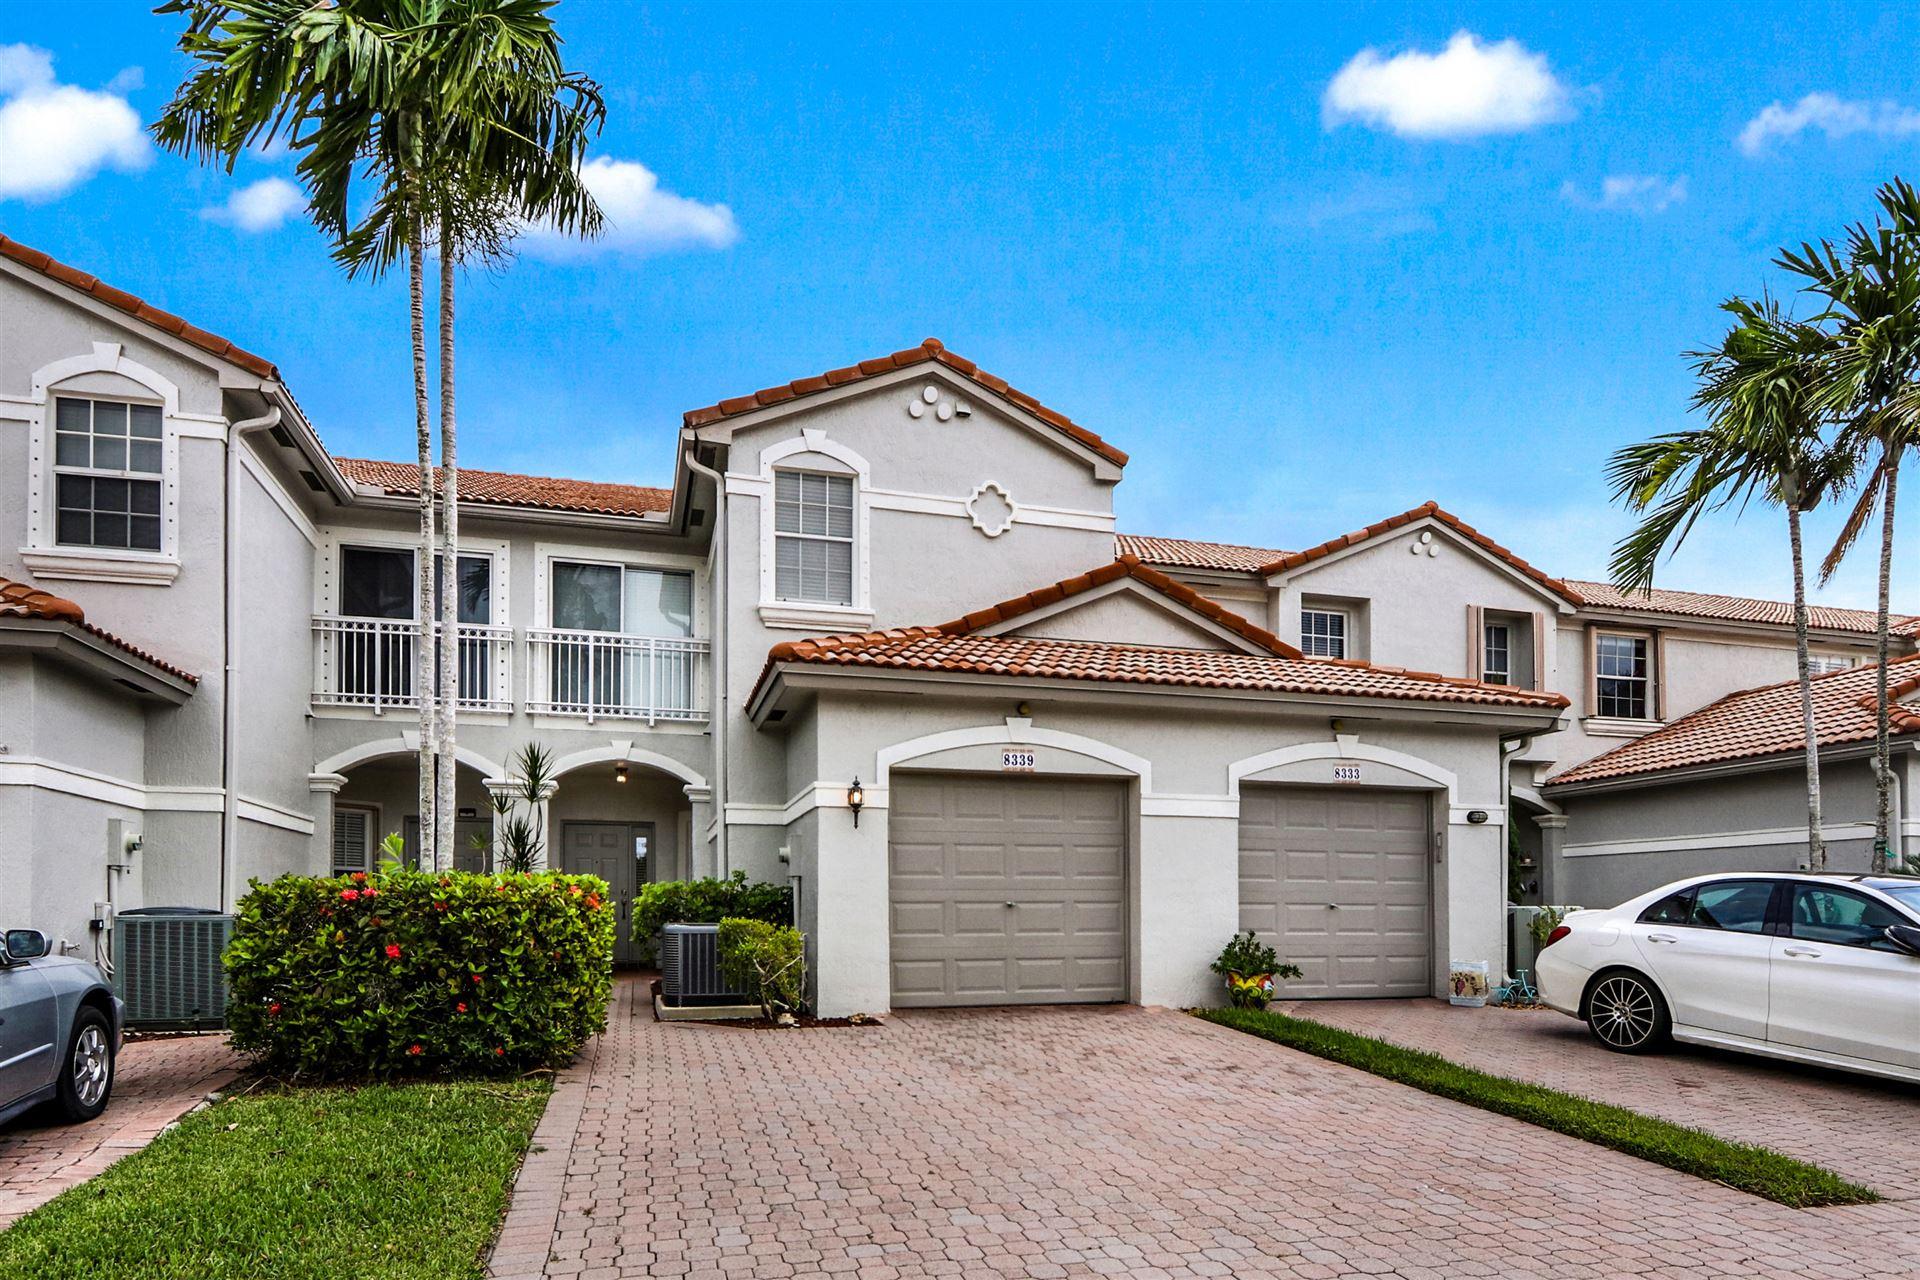 8339 Via Leonessa, Boca Raton, FL 33433 - MLS#: RX-10712654